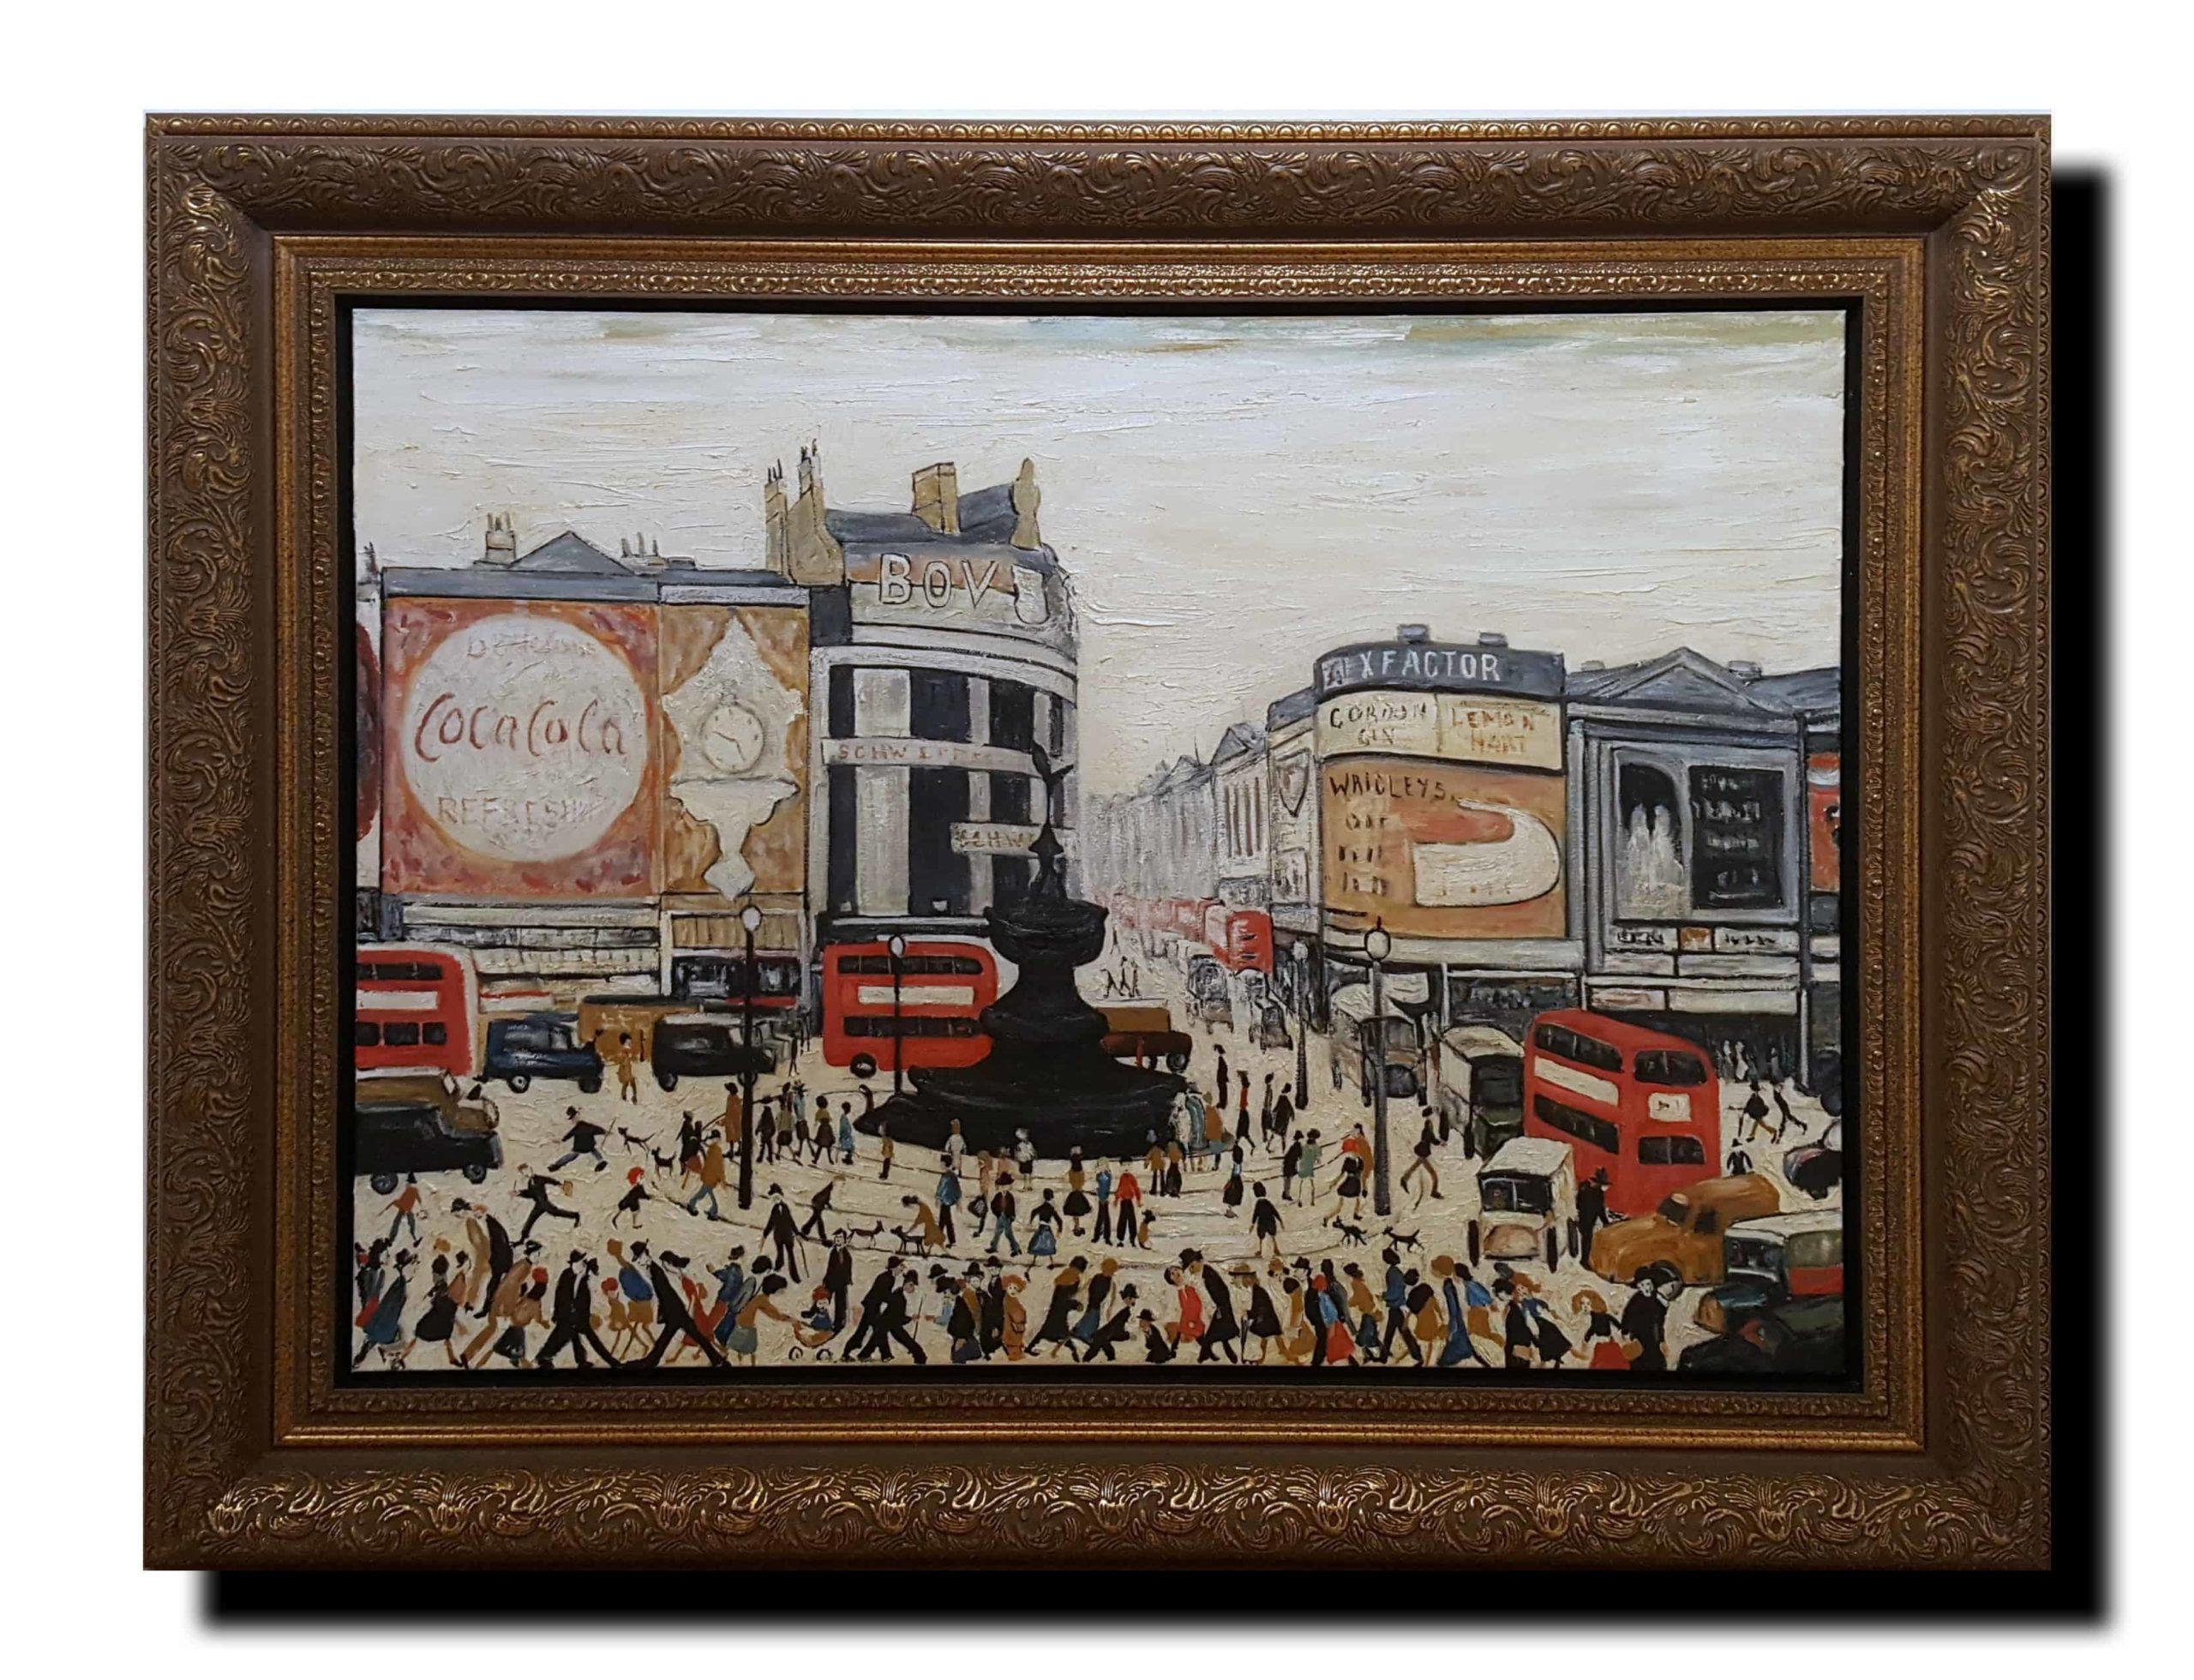 Piccadilly framed